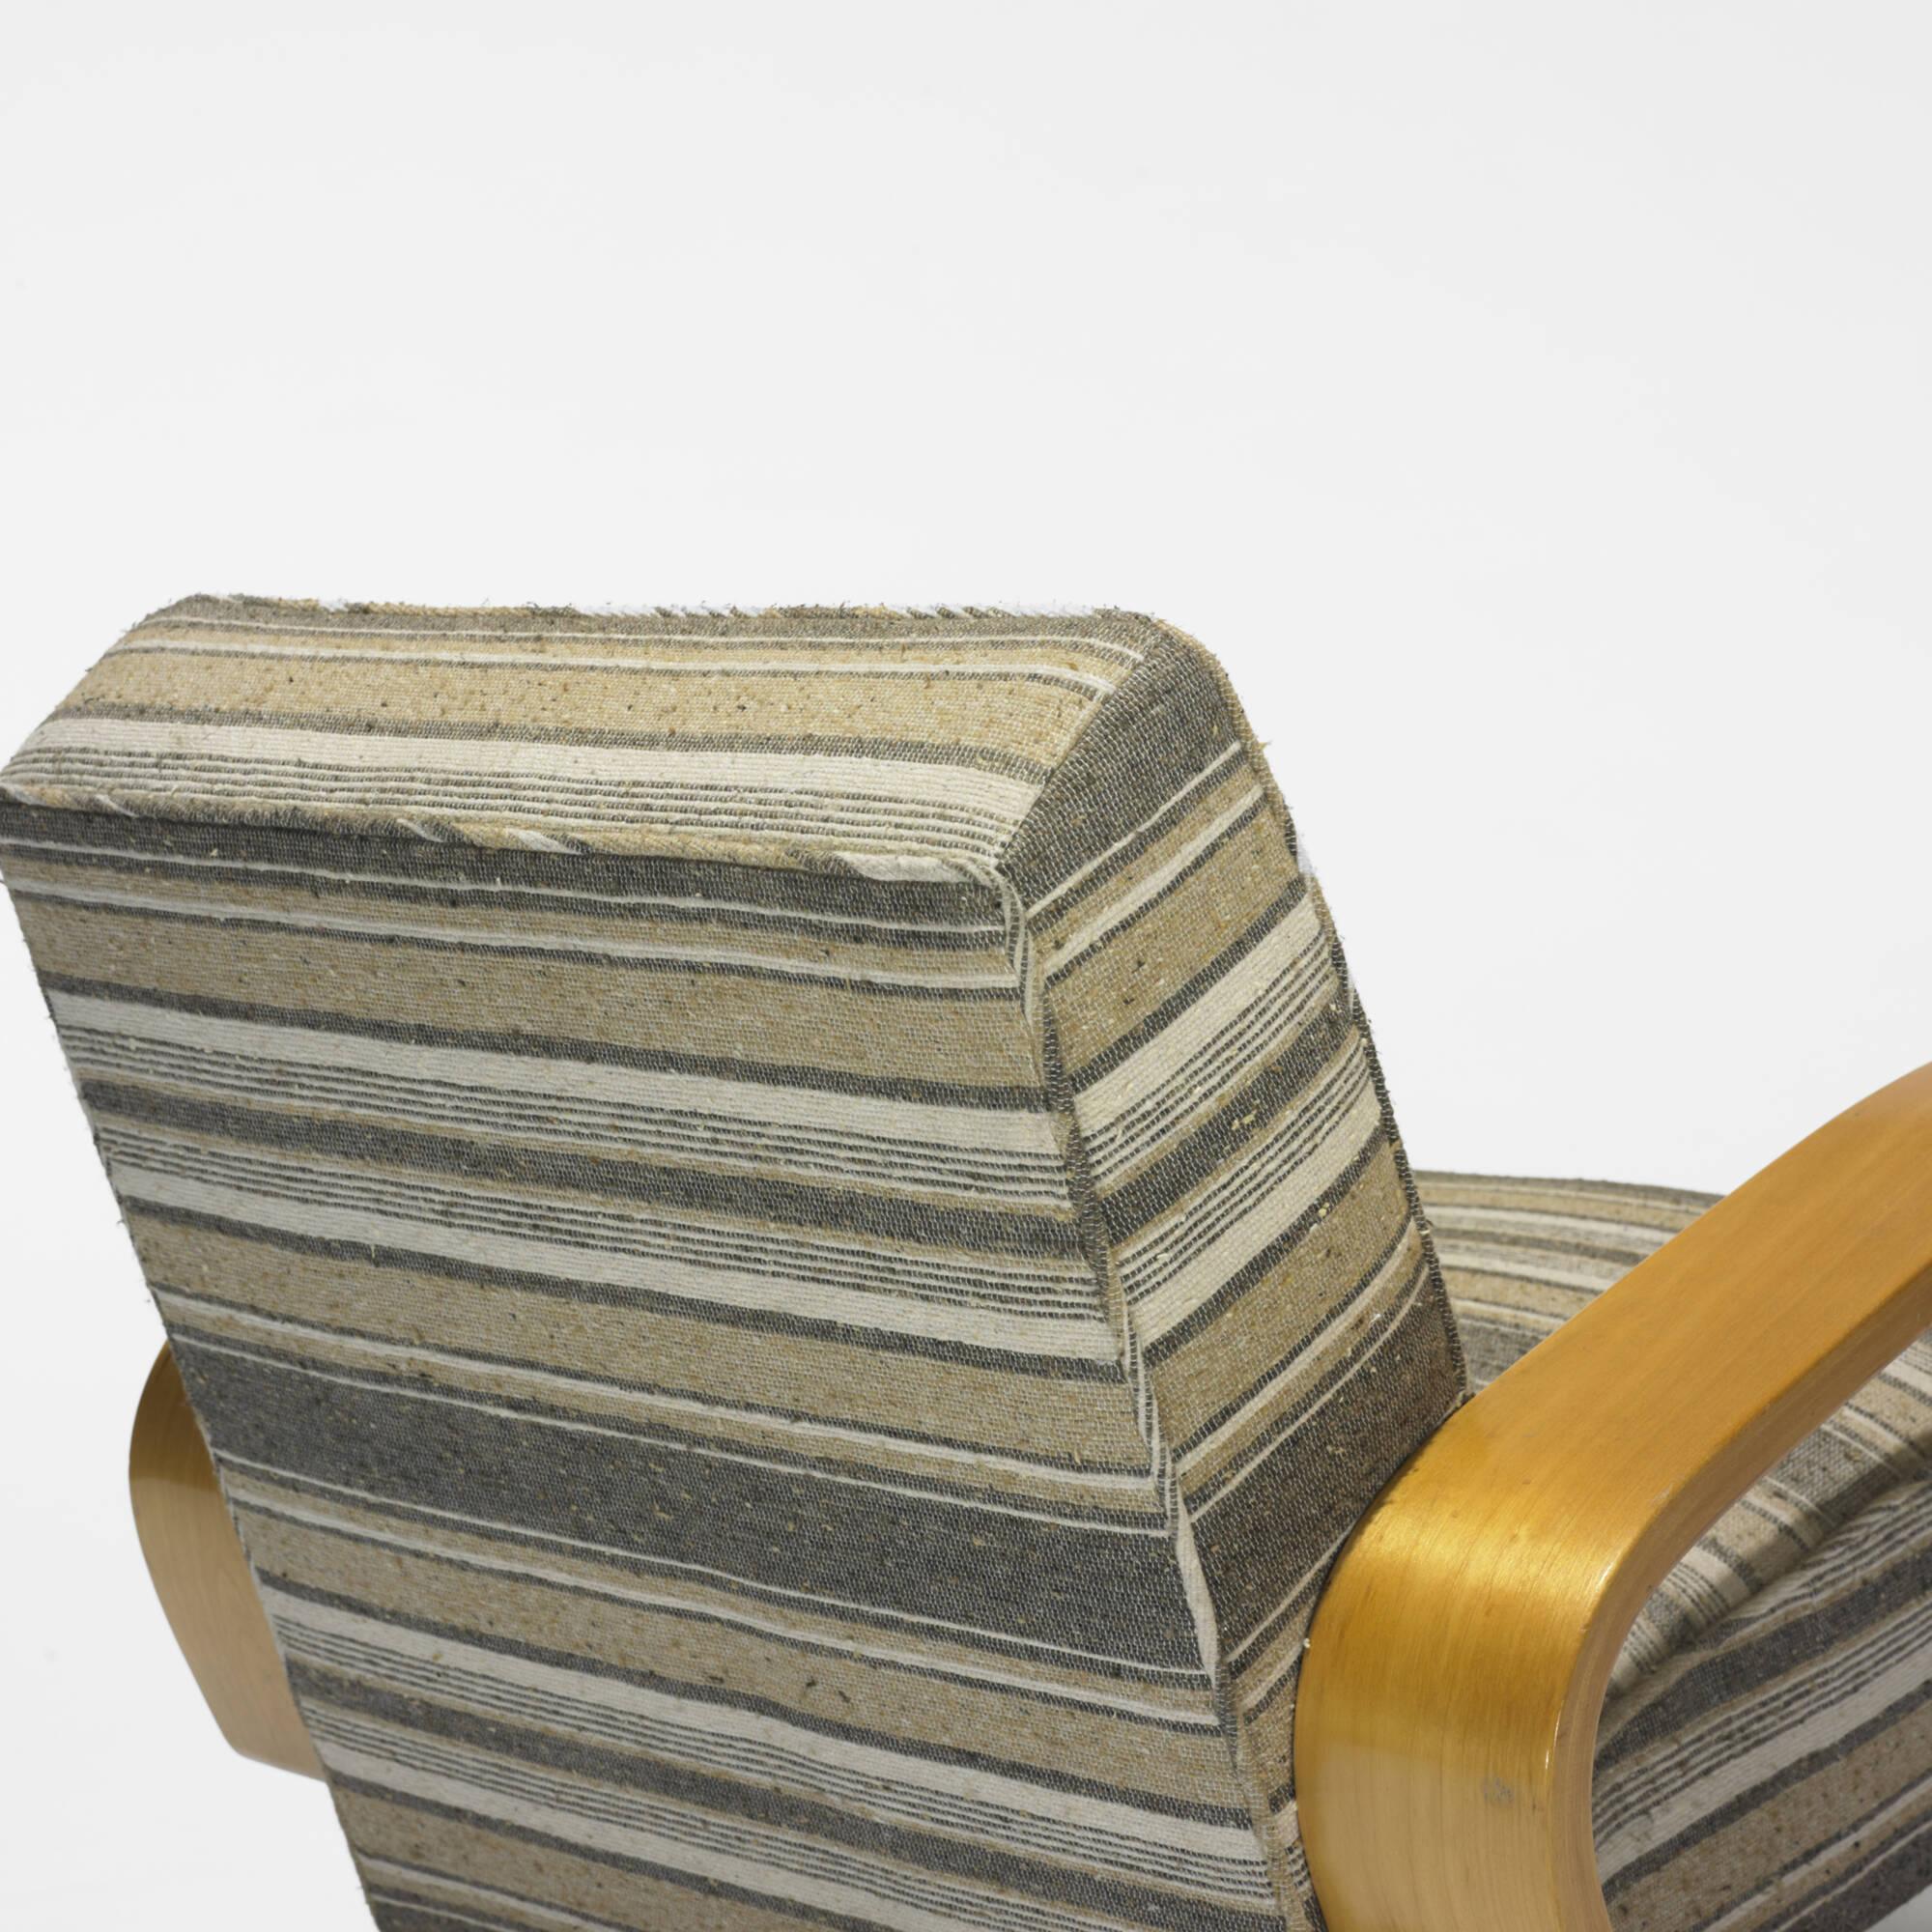 204 Alvar Aalto Tank lounge chair model 37 400 Scandinavian